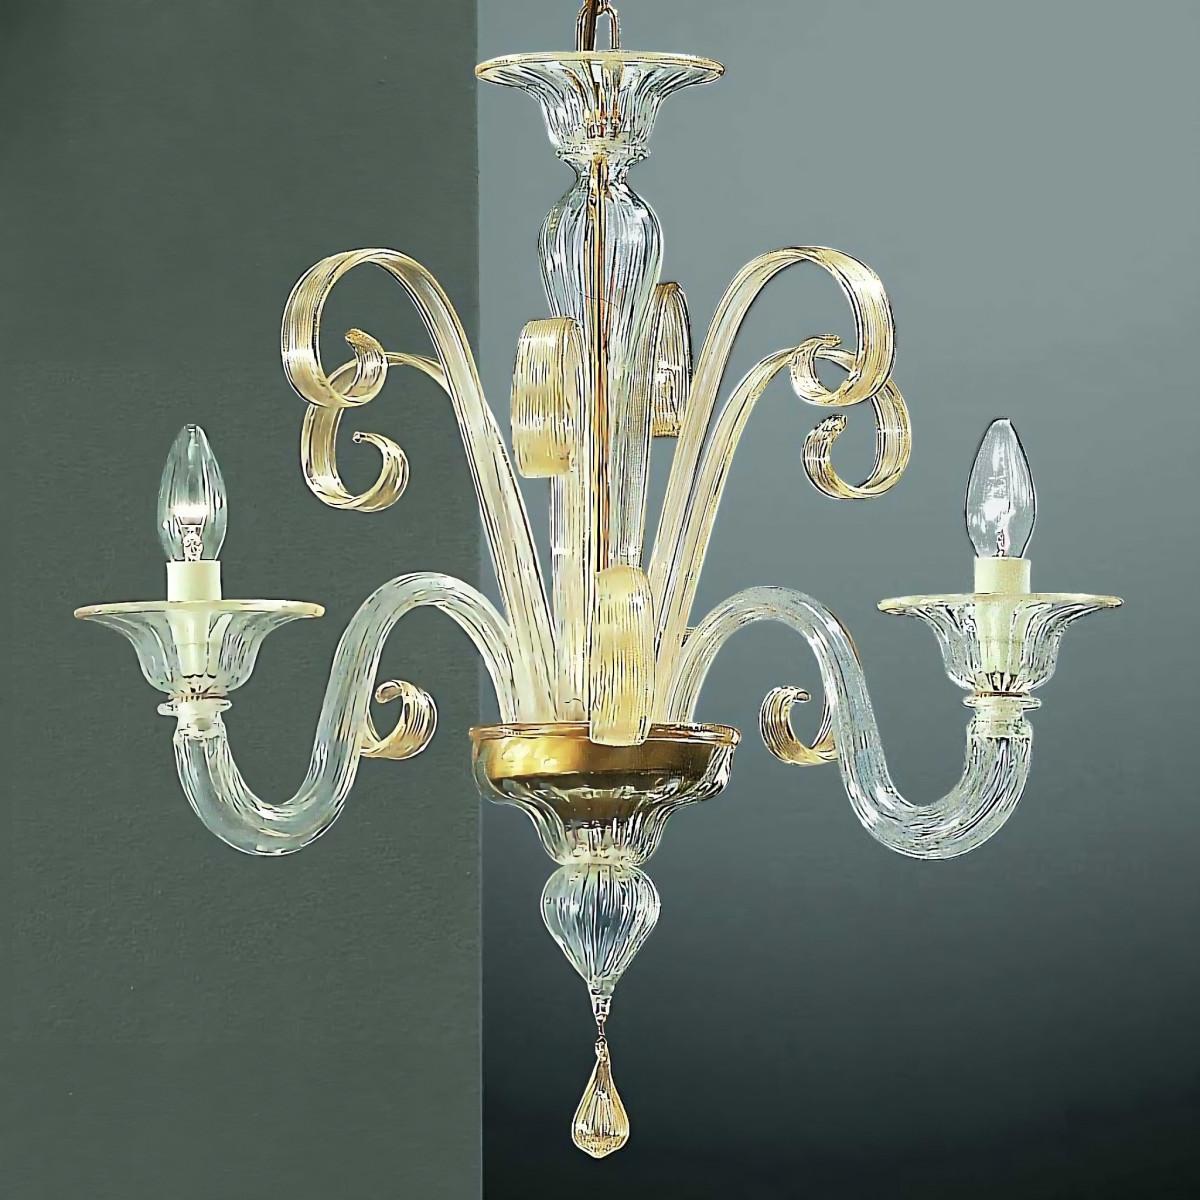 Goldoni 3 flammig Murano Kronleuchter - transparente Gold Farbe